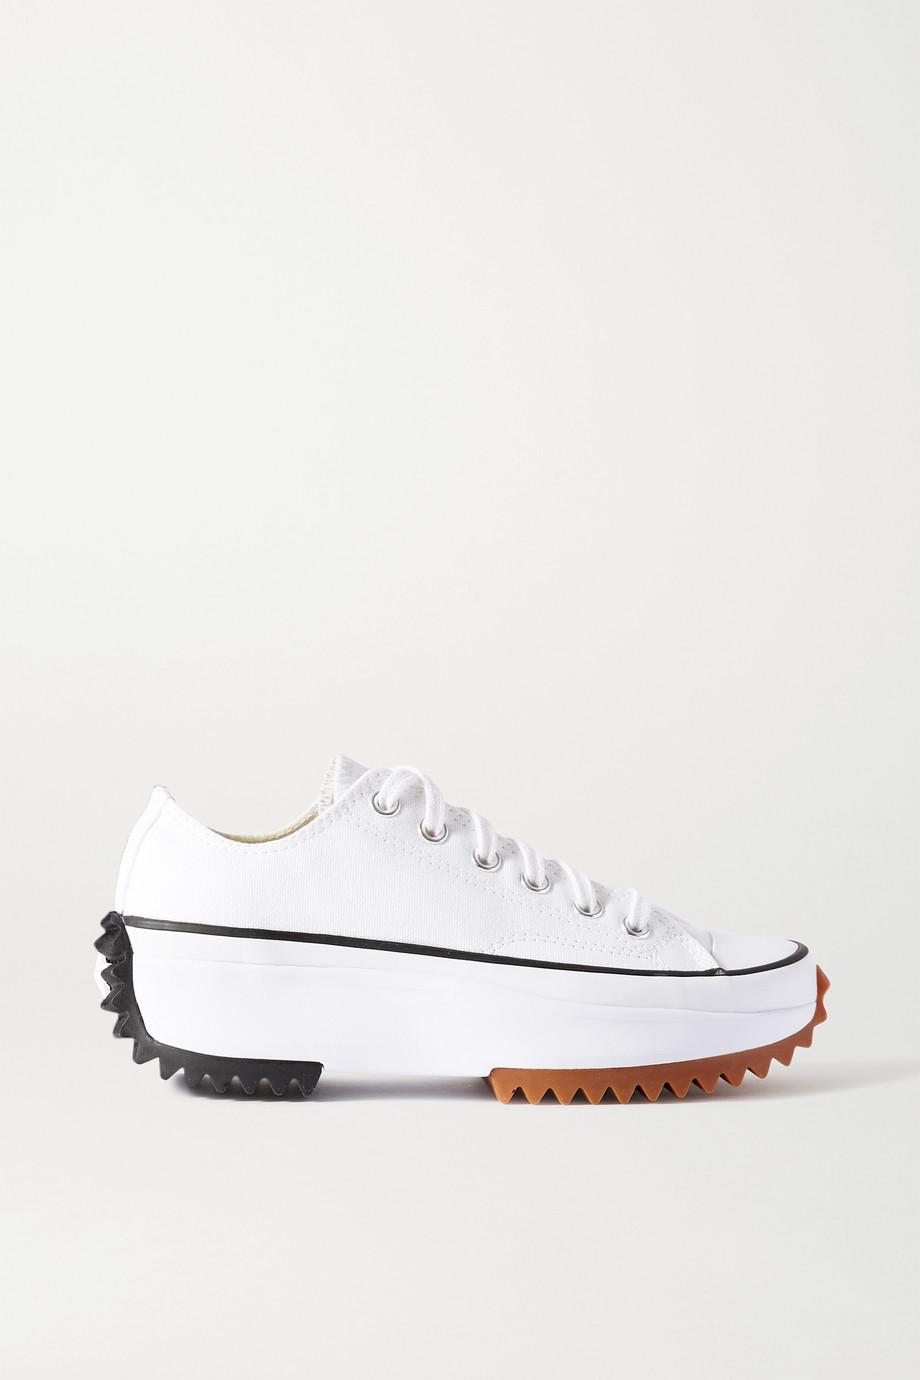 Converse Run Star Hike canvas platform sneakers